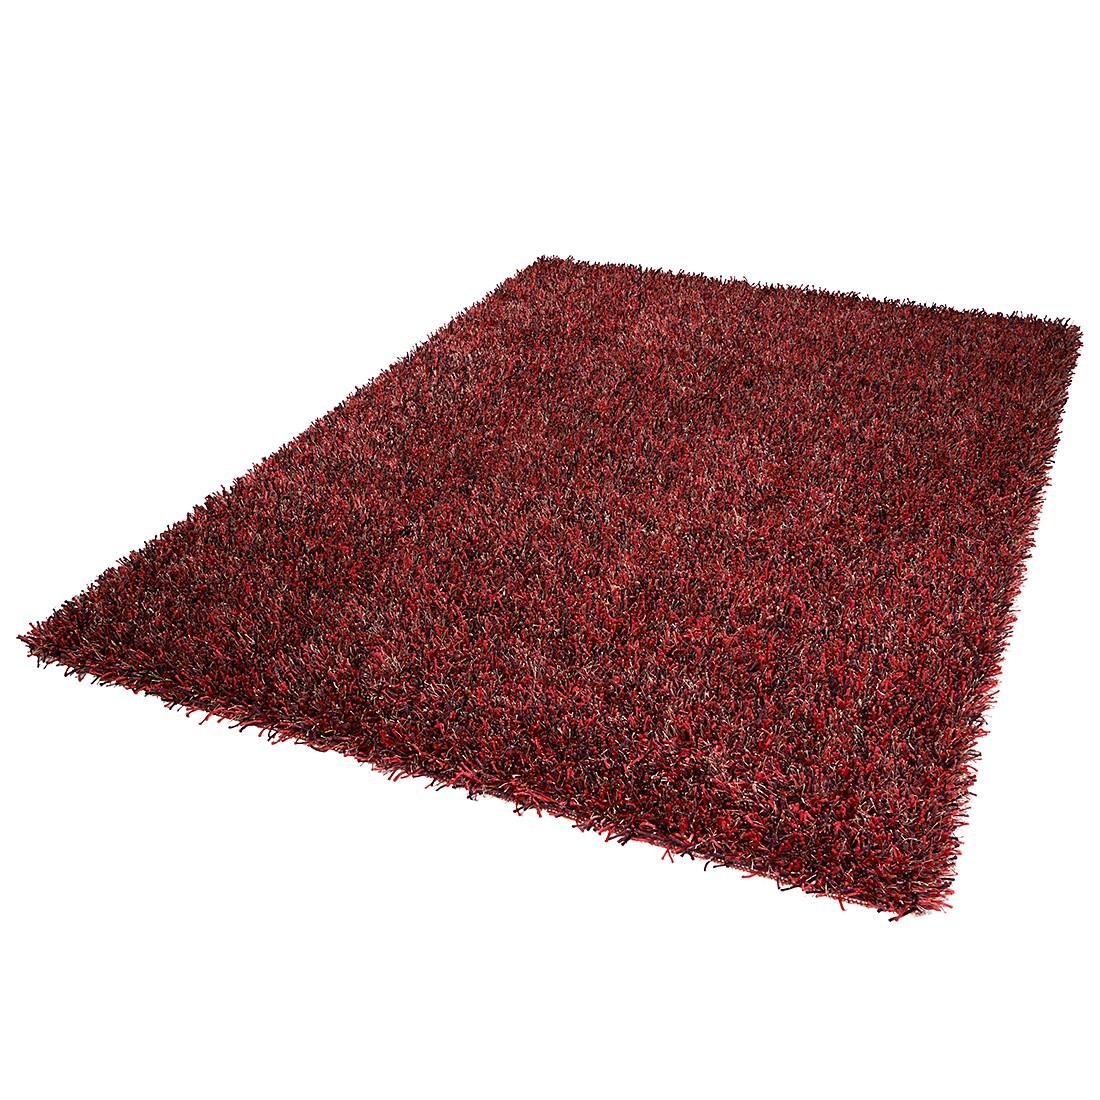 Teppich Corado – Bordeaux – 60 x 130 cm, DEKOWE jetzt bestellen